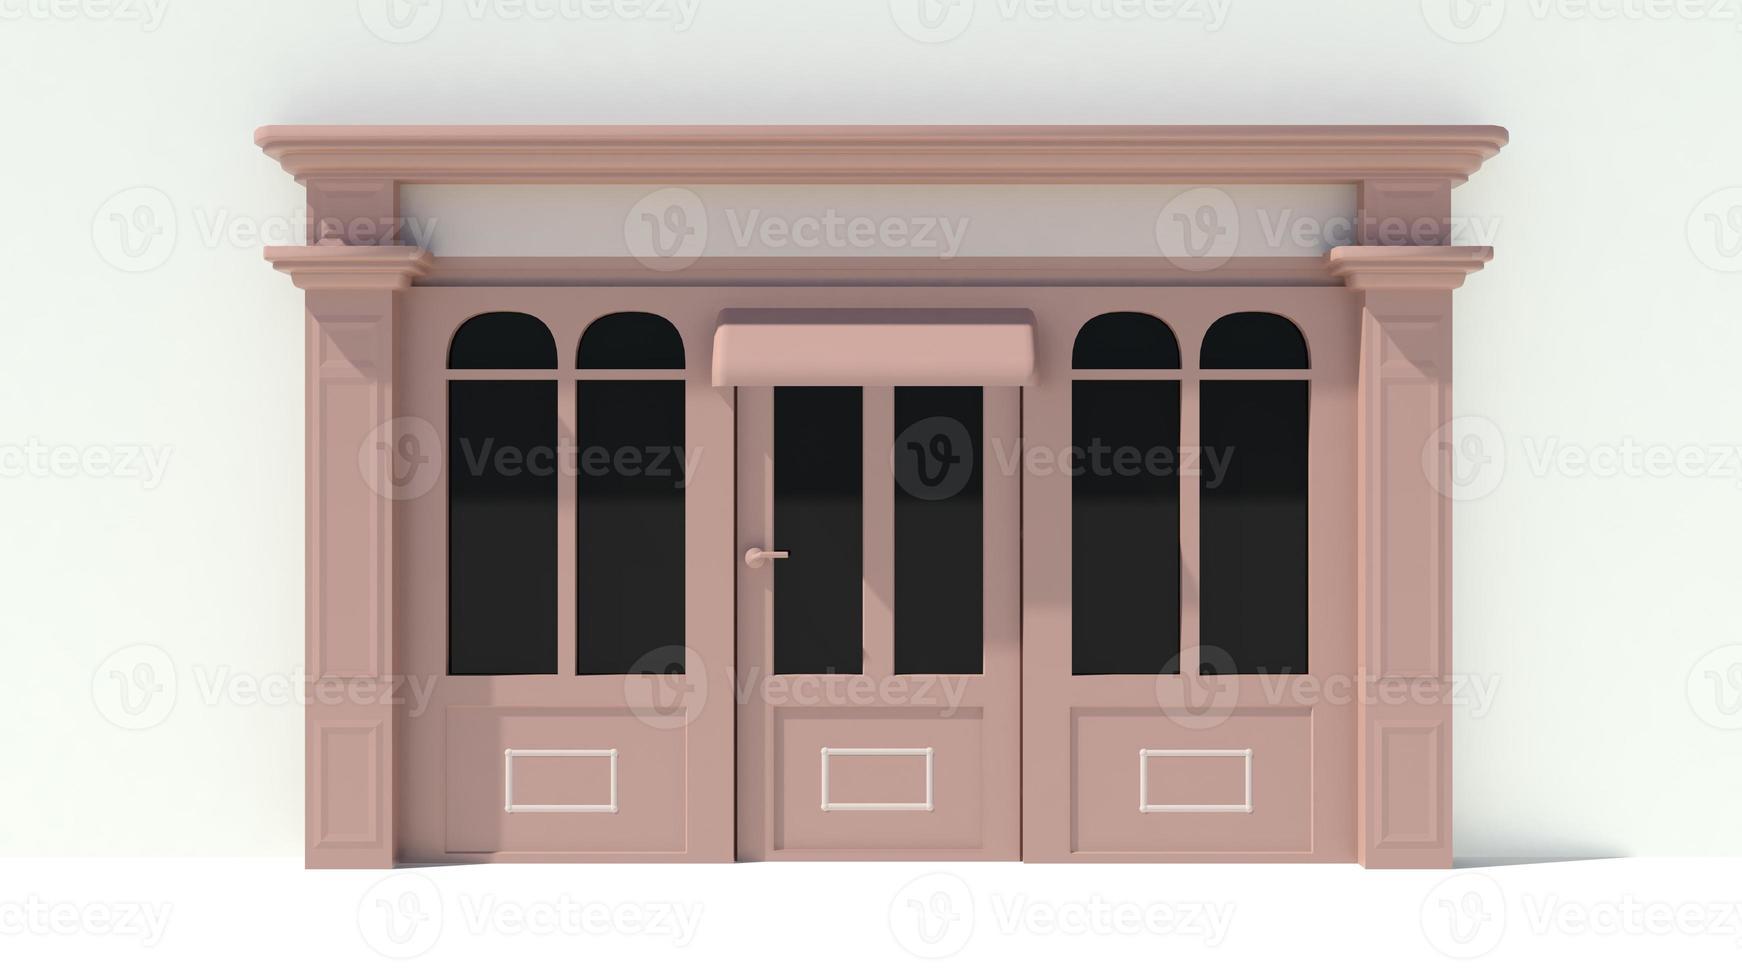 zonnig winkelpui met grote ramen met witte en bruine winkelgevel foto